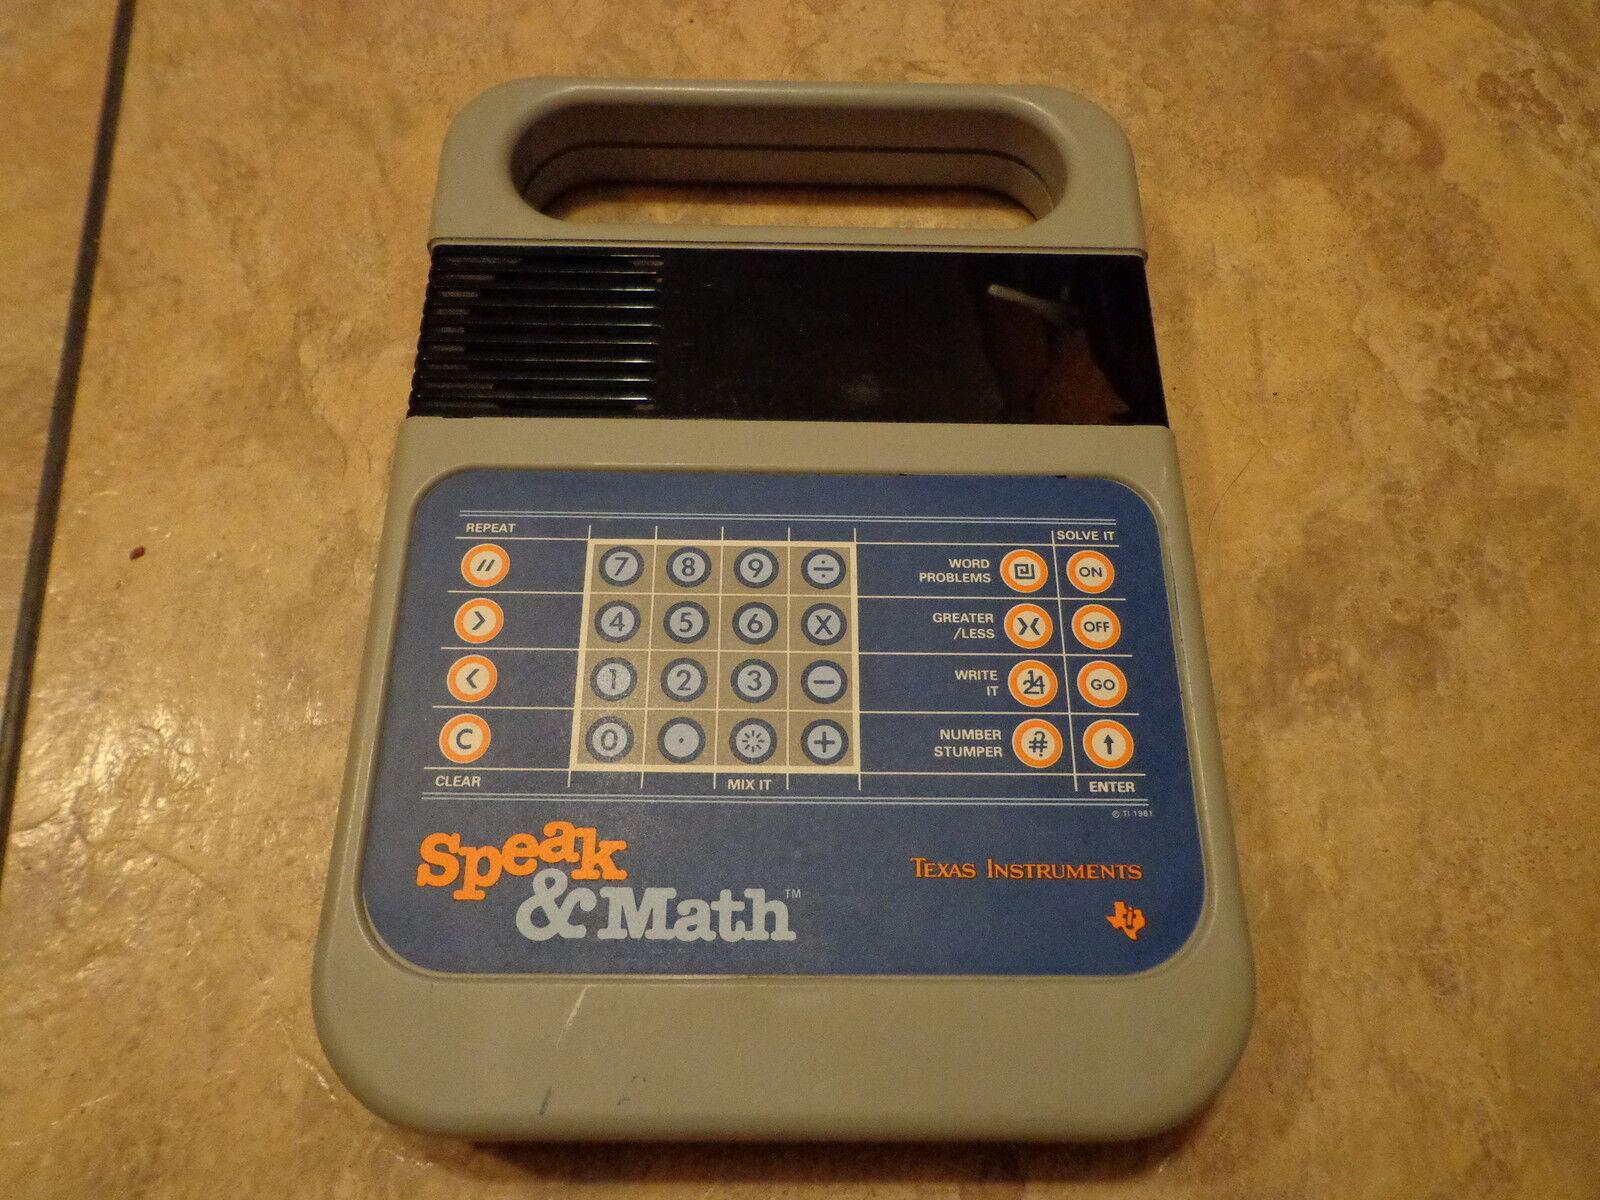 OLD TEXAS INSTRUMENTS--ELECTRONIC SPEAK & MATH MATH MATH (LOOK) 1d014d